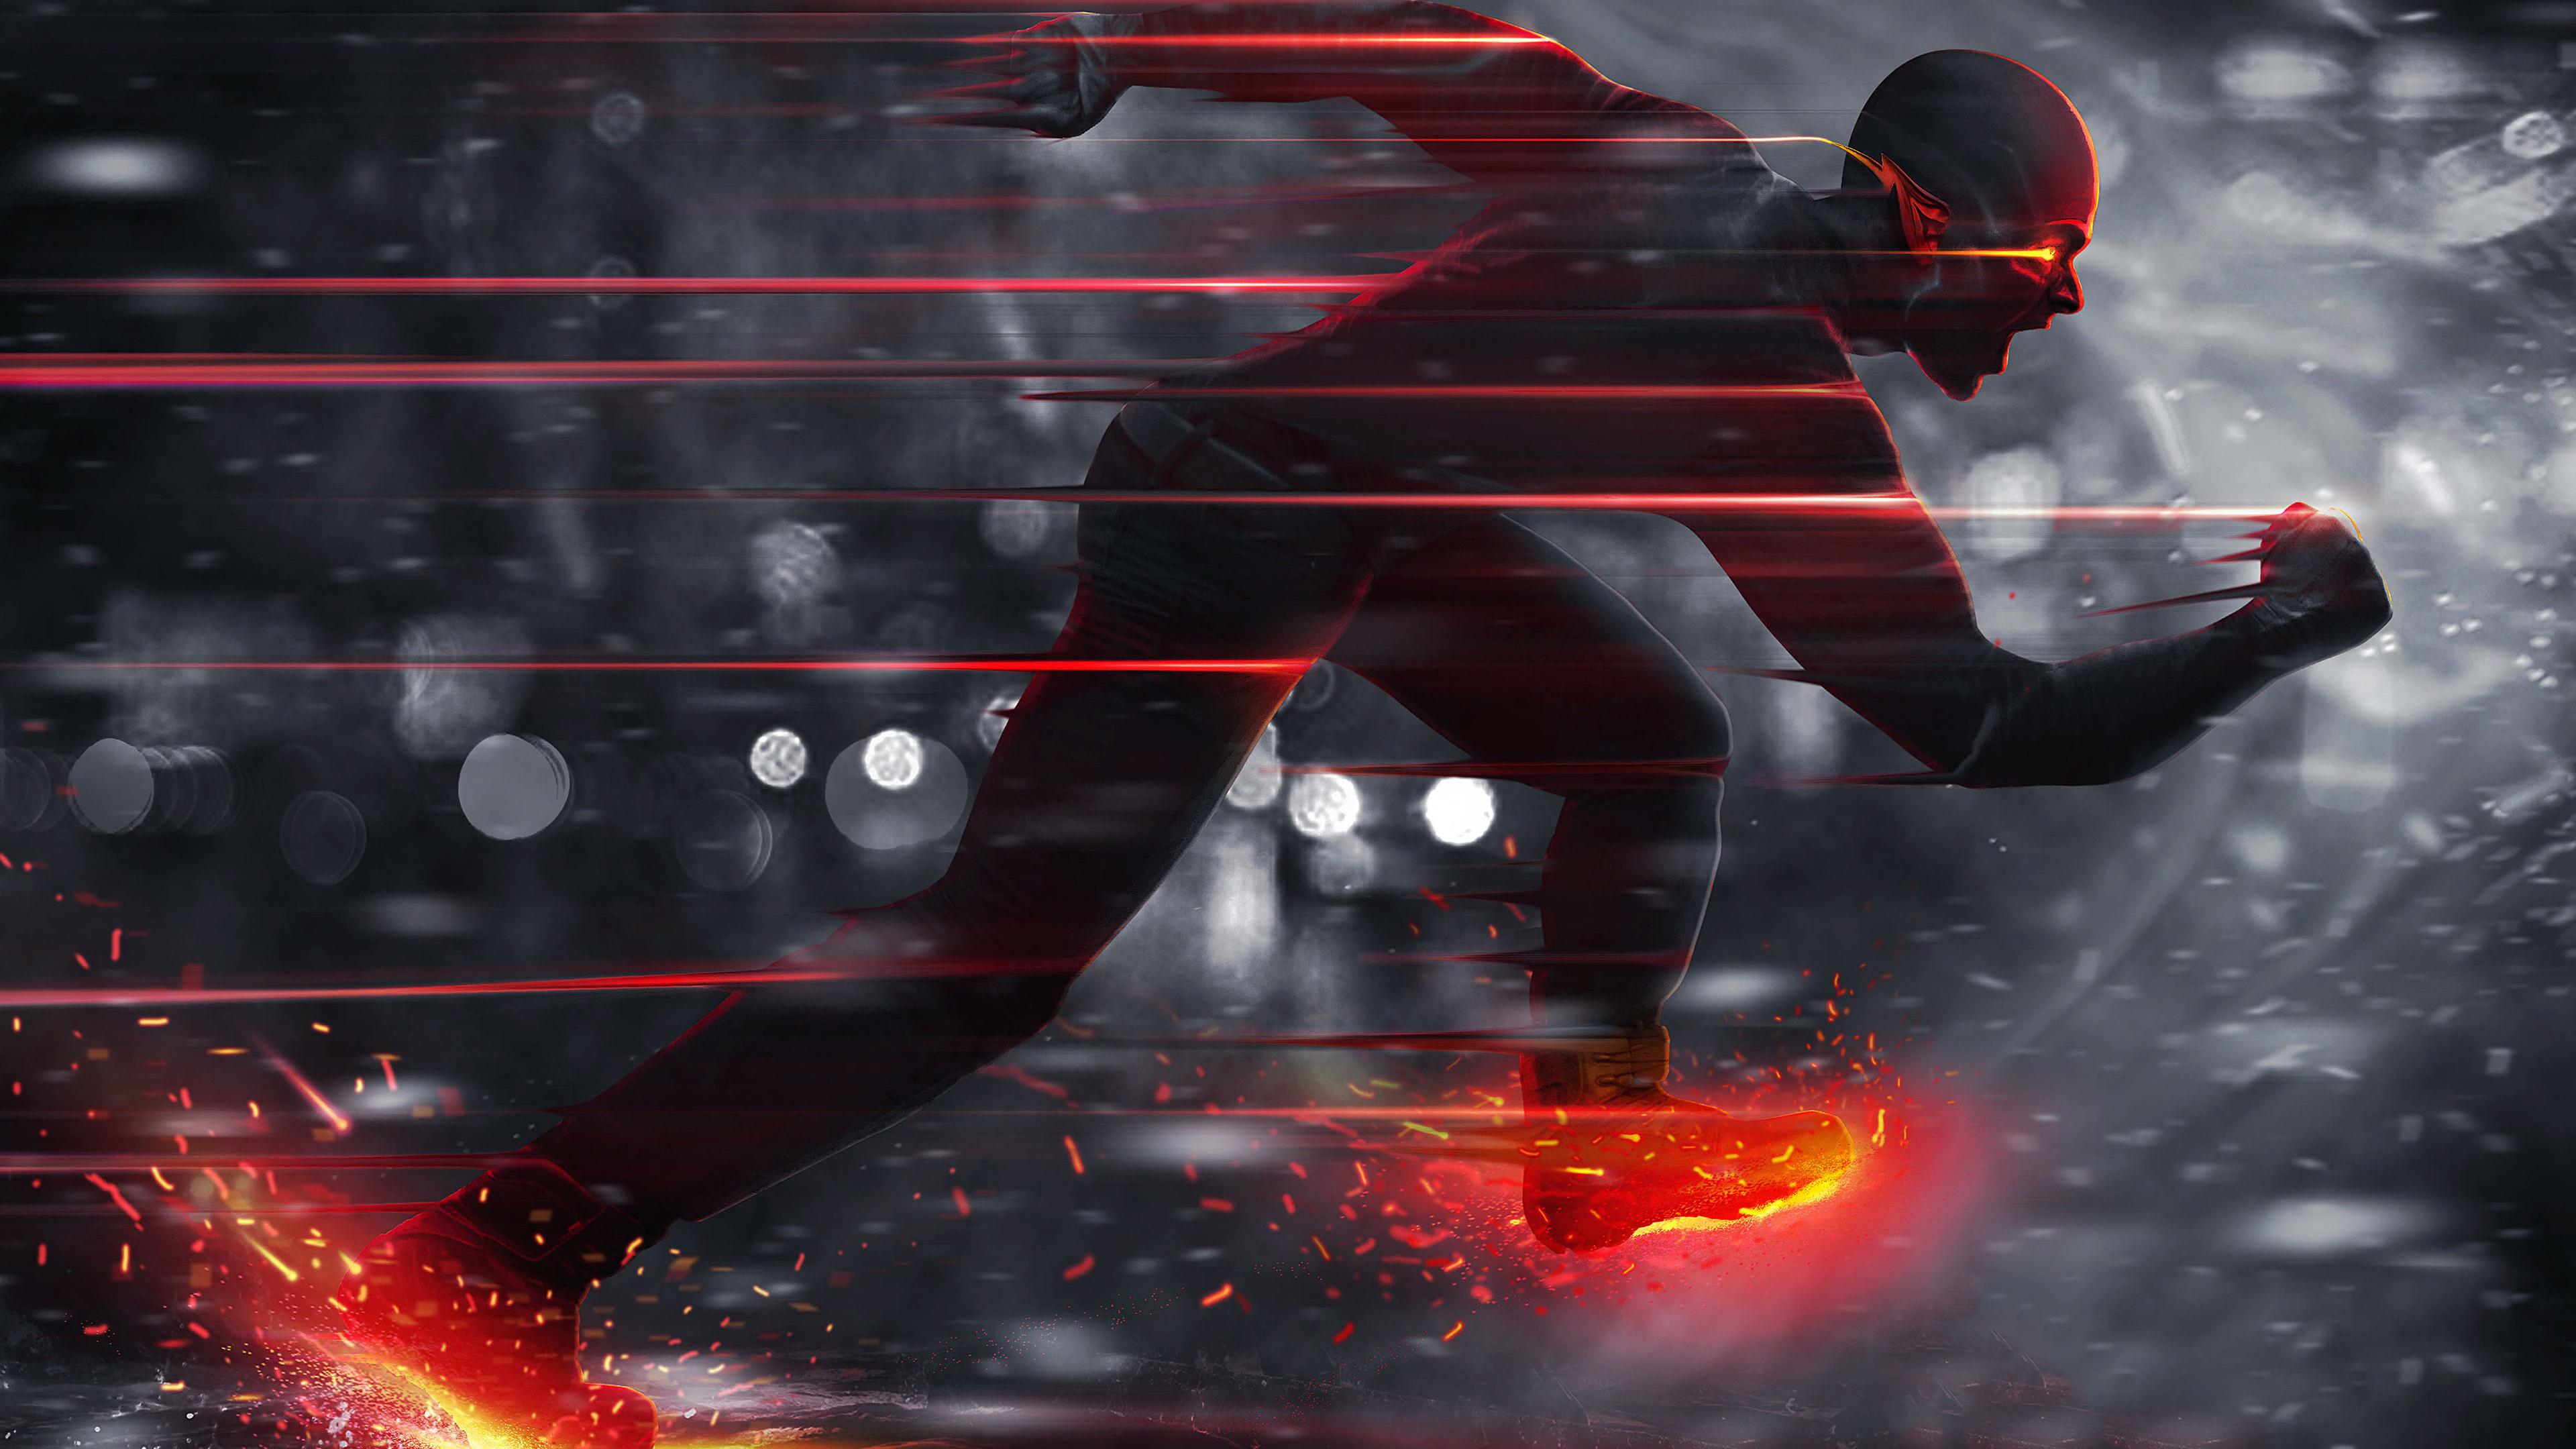 the flash cosplay 4k 1539452747 - The Flash Cosplay 4k - the flash wallpapers, supervillain wallpapers, superheroes wallpapers, hd-wallpapers, flash wallpapers, cosplay wallpapers, behance wallpapers, 4k-wallpapers